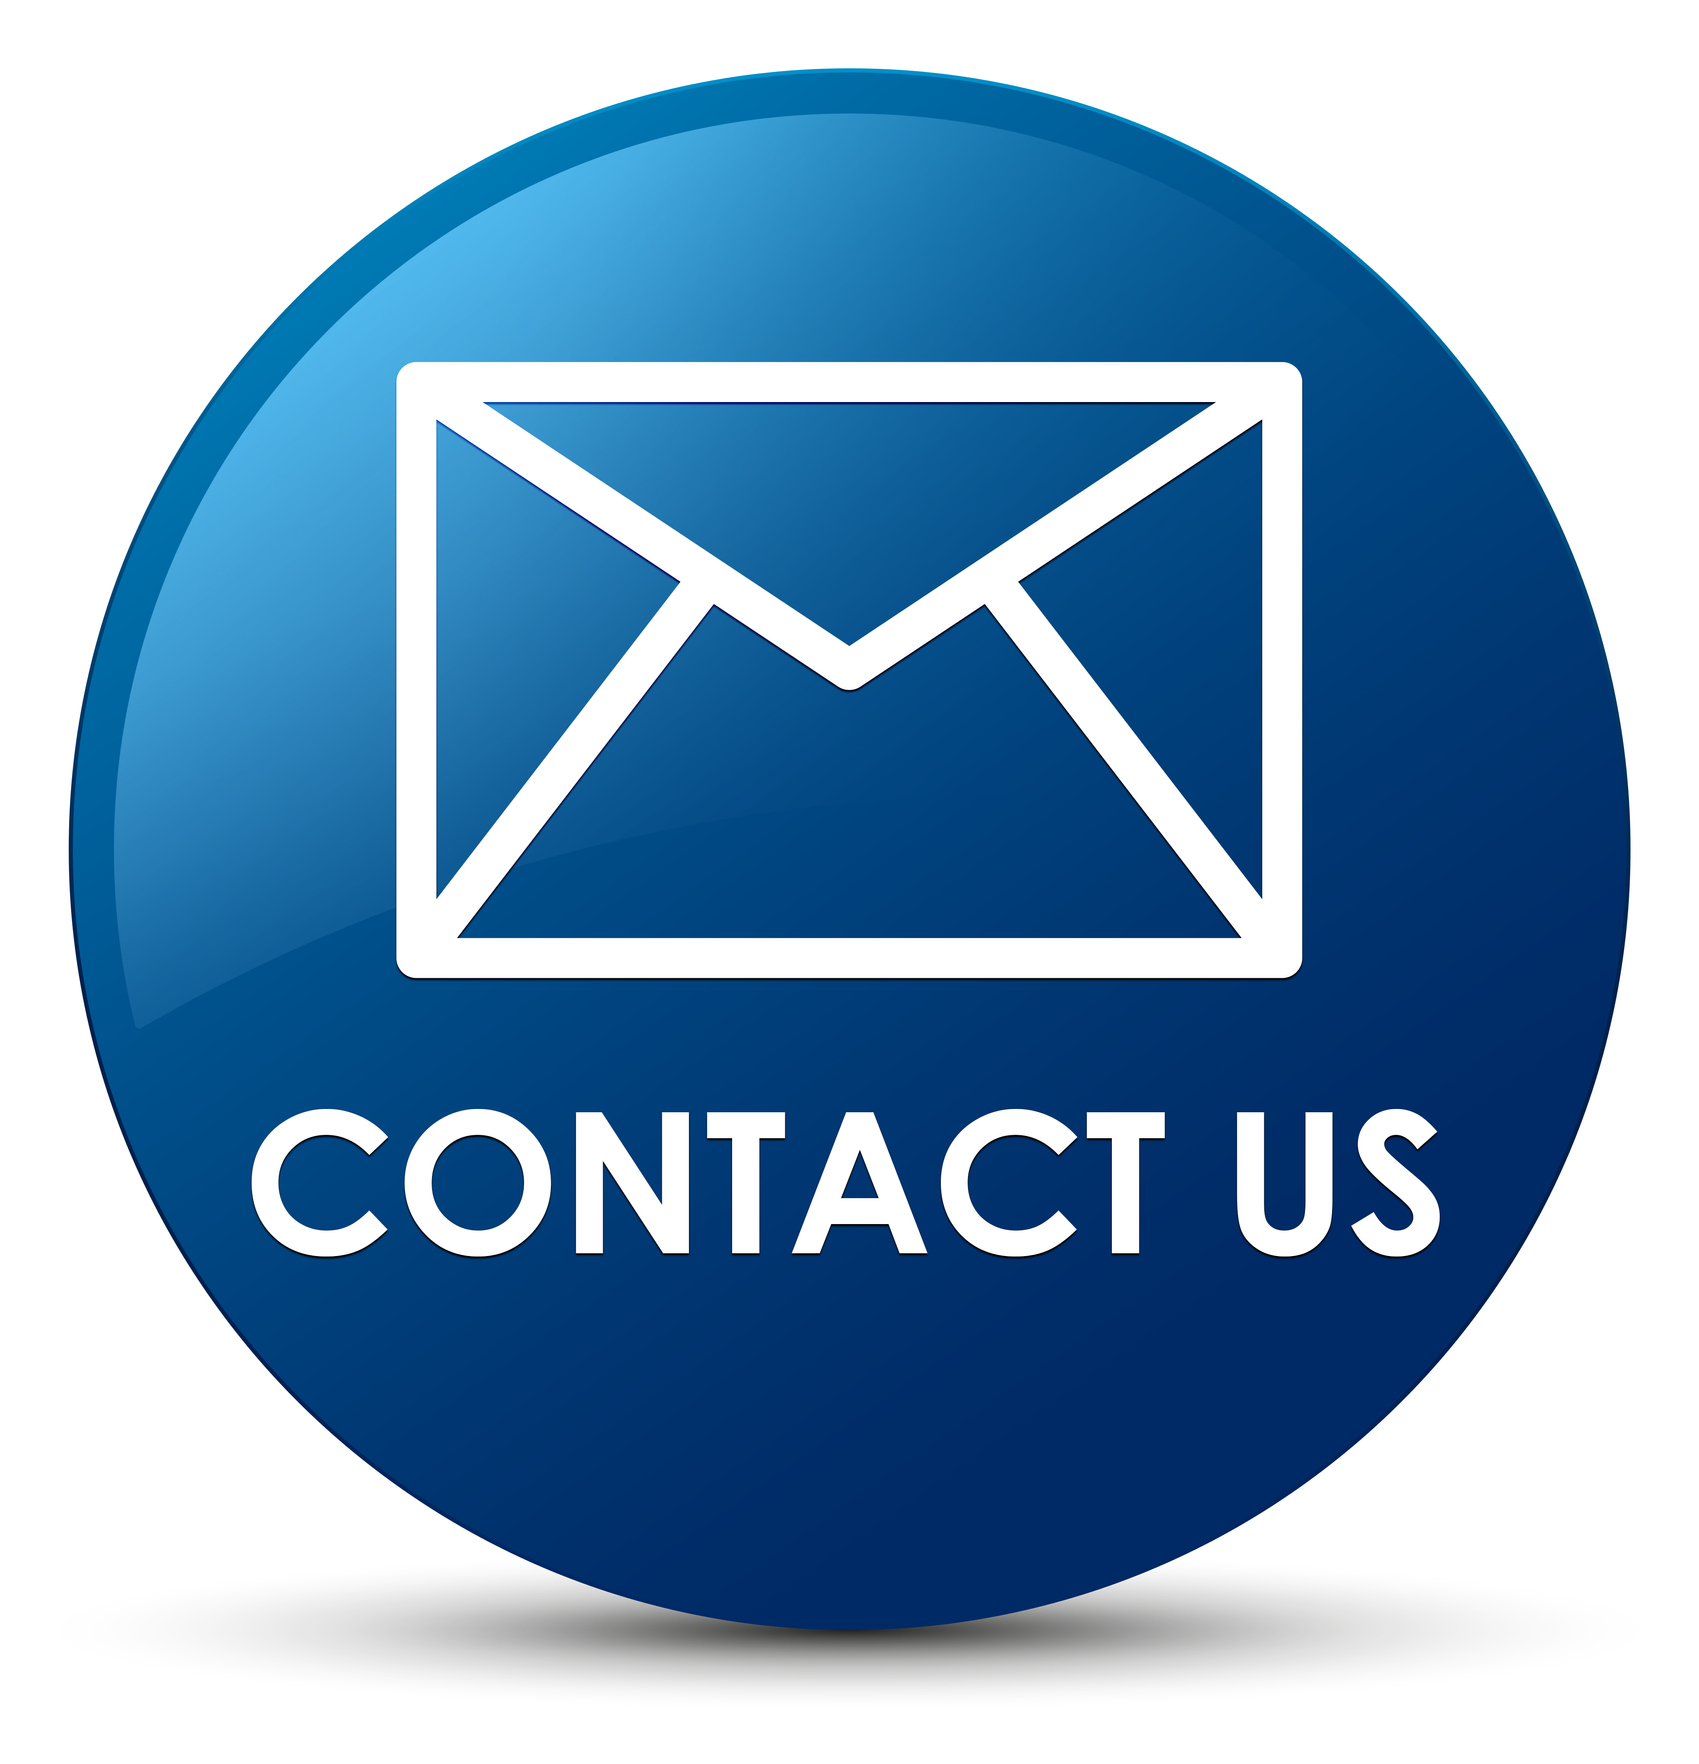 Contact Us_Button.jpg